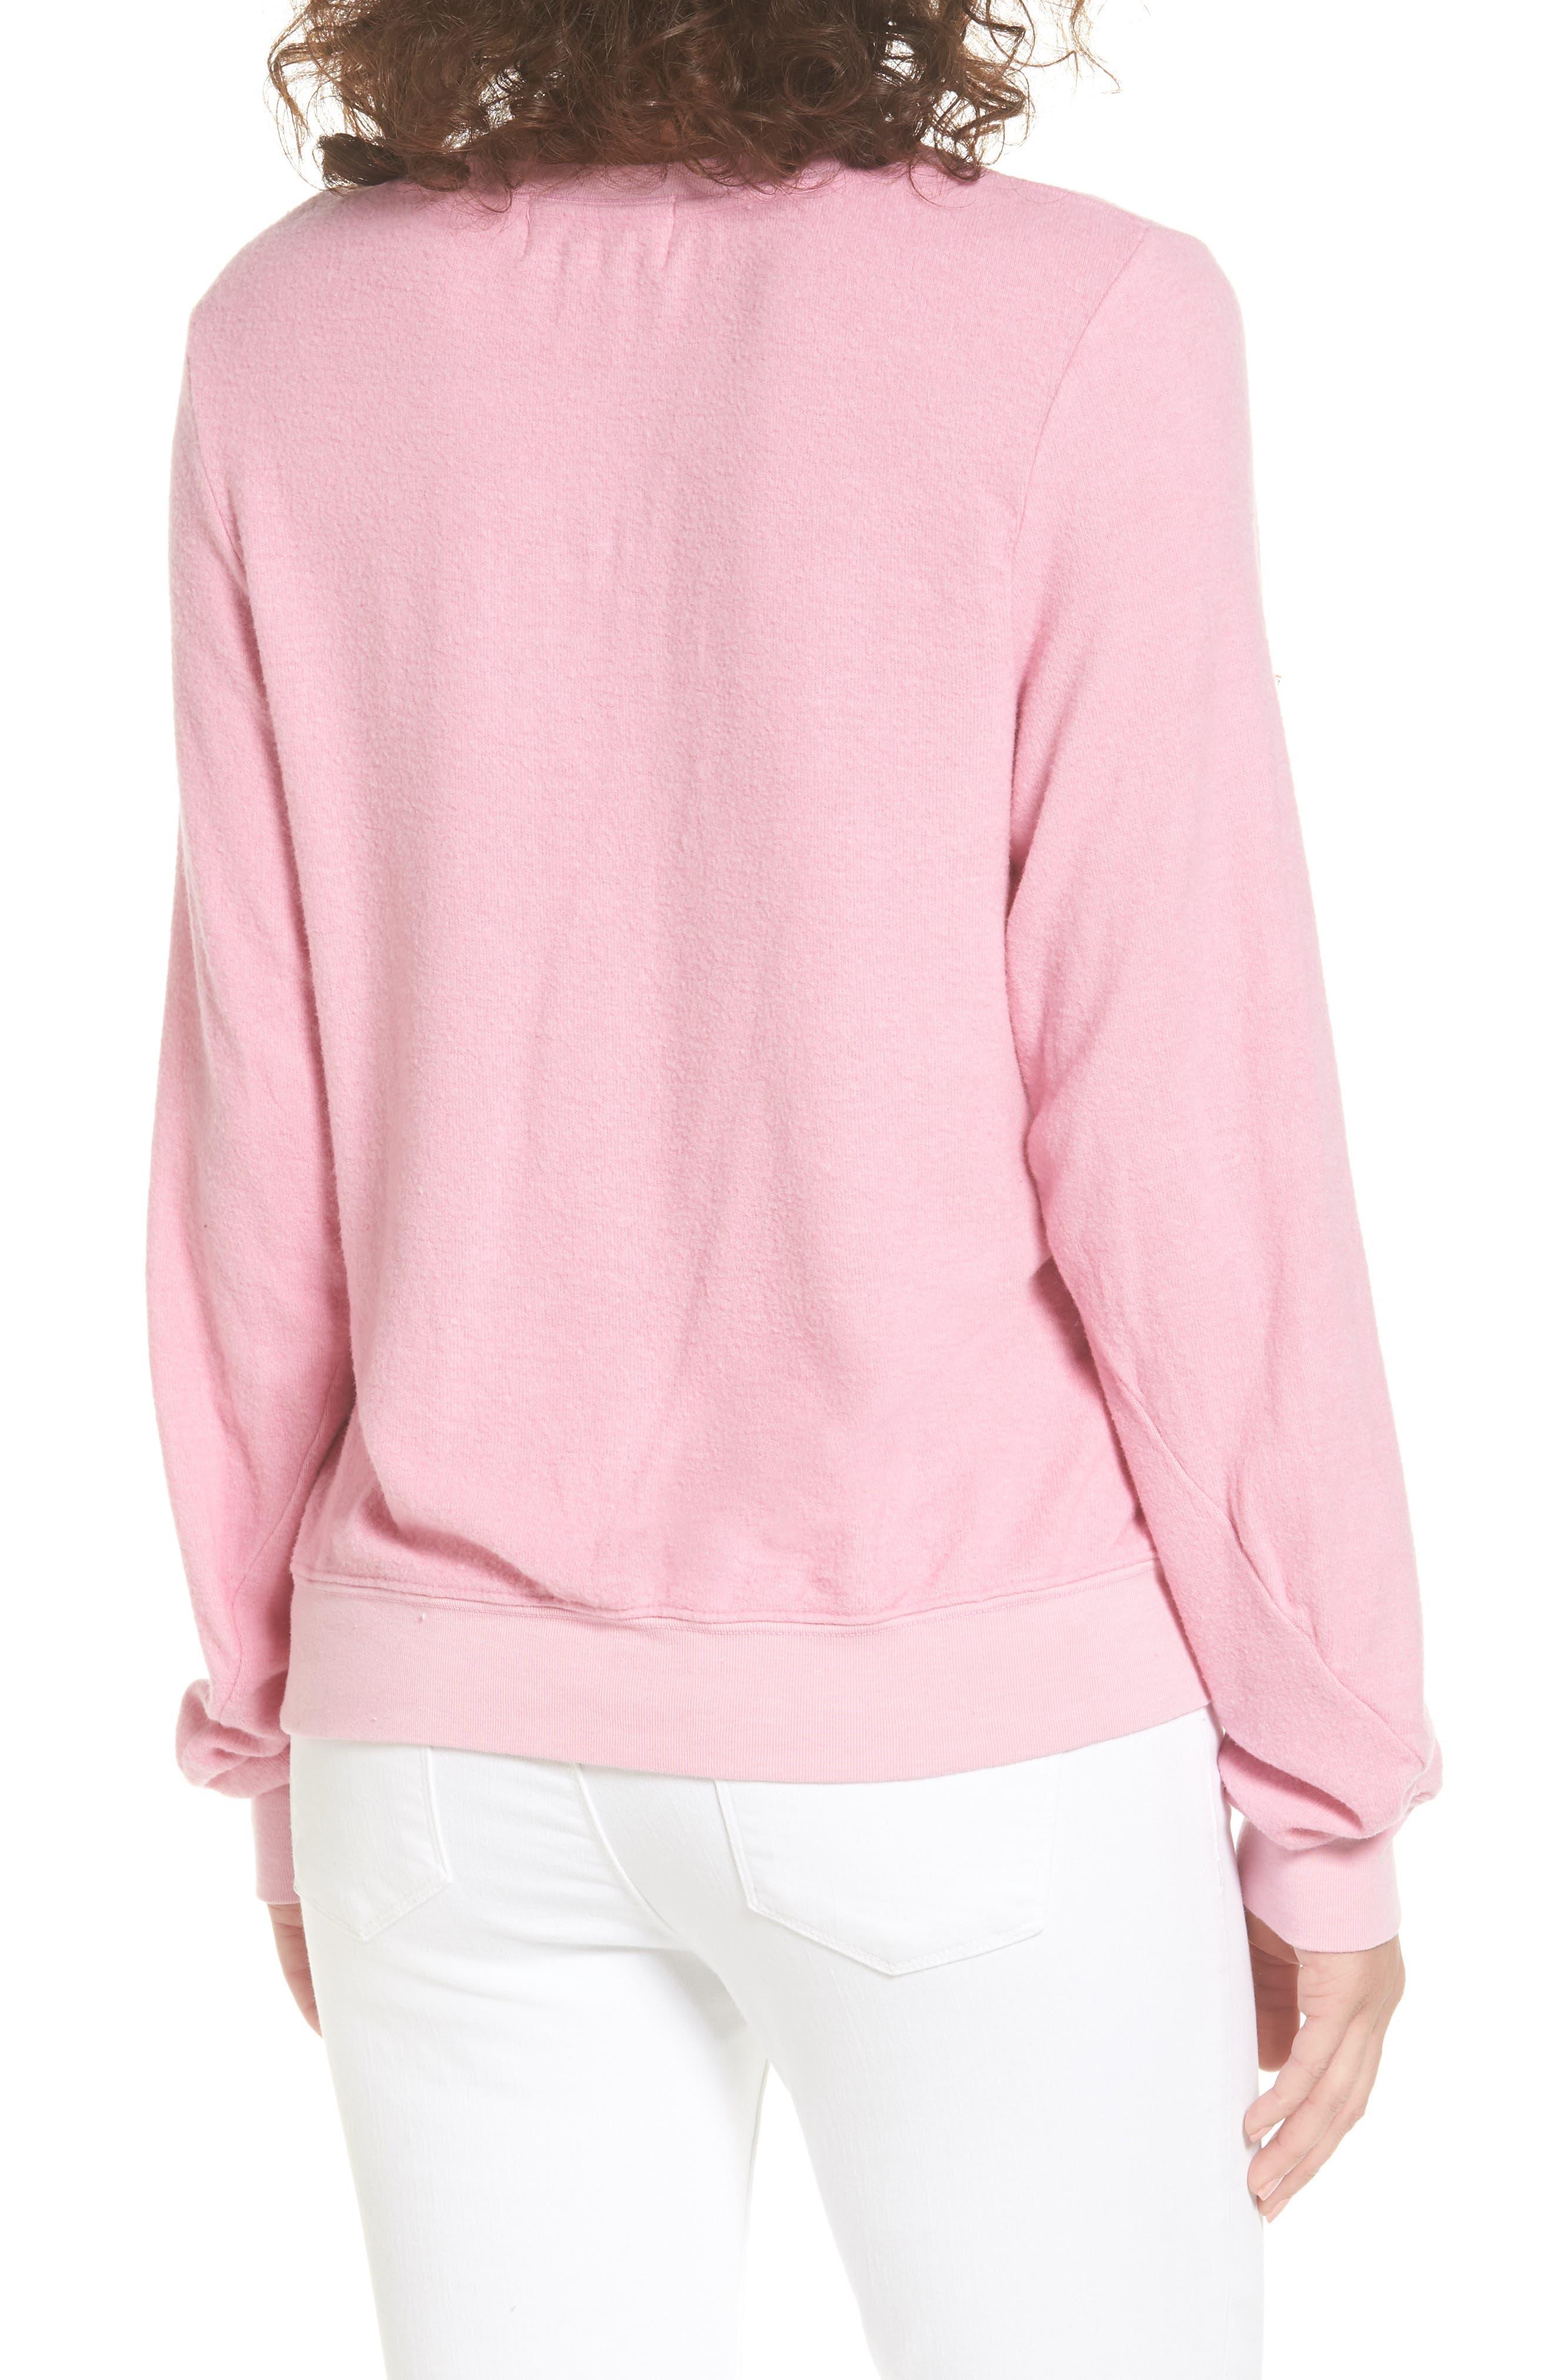 Friday Sweatshirt,                             Alternate thumbnail 2, color,                             Pink